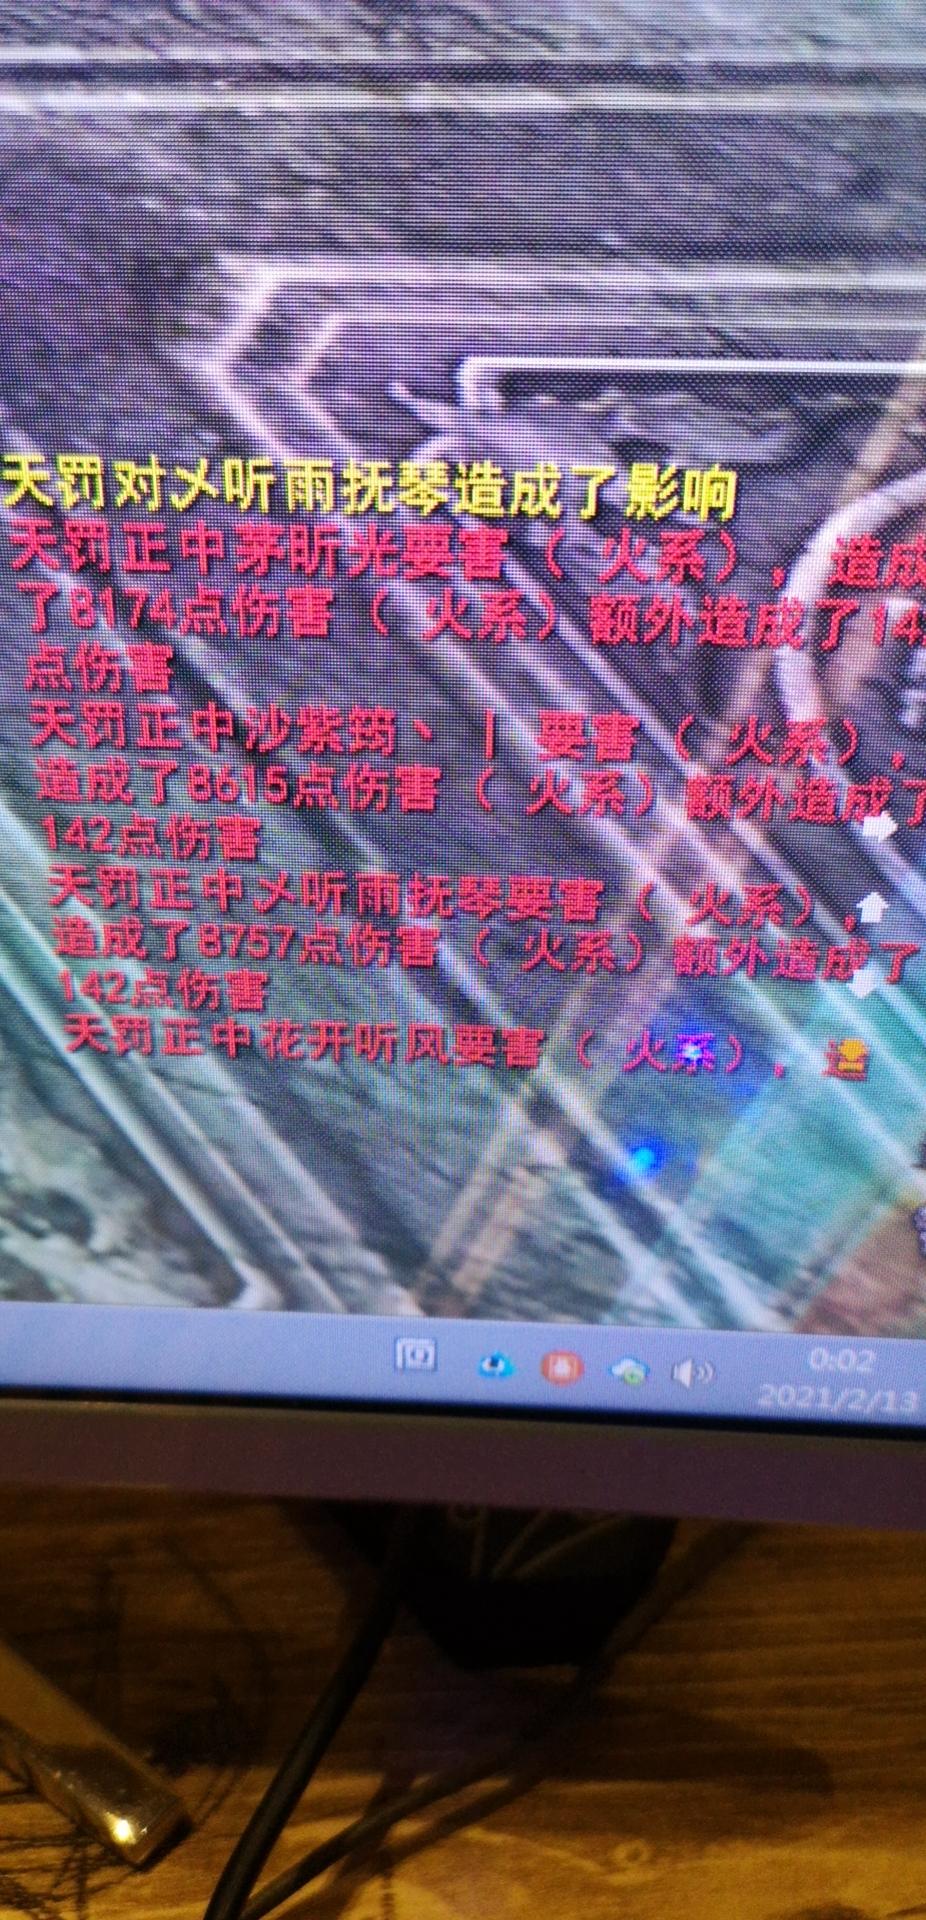 wx_camera_1613145768961.jpg